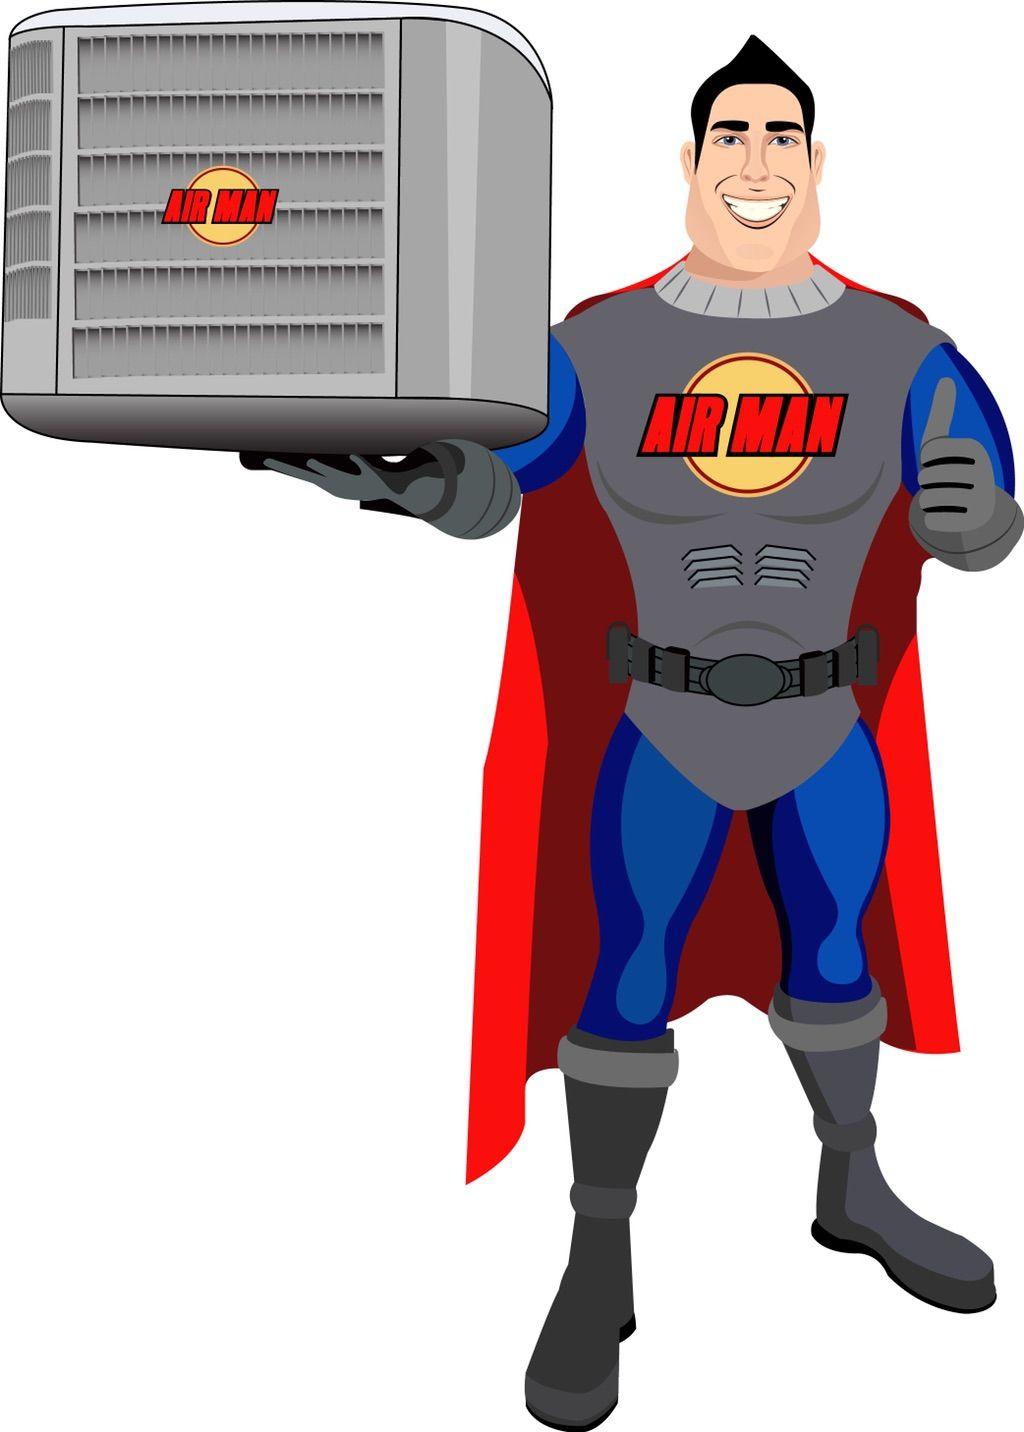 Air man heating & cooling